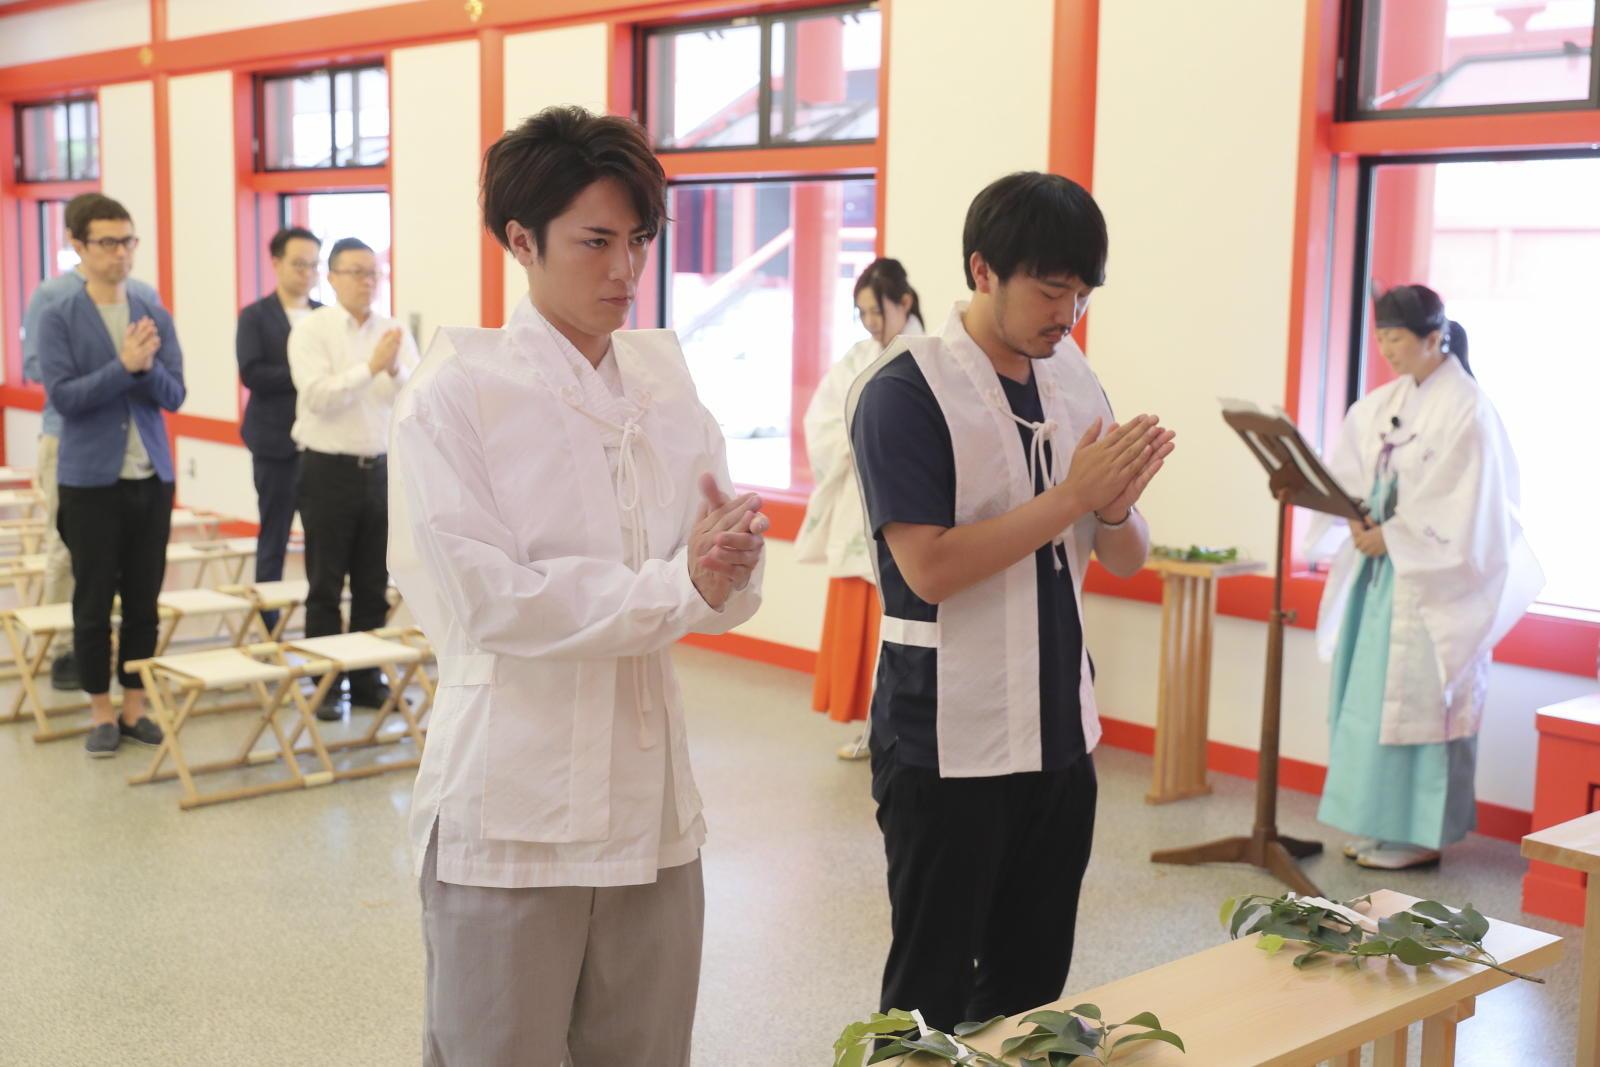 http://news.yoshimoto.co.jp/20170716174834-0679575982c7e28e72b7084bd0a8fb68306345c7.jpg